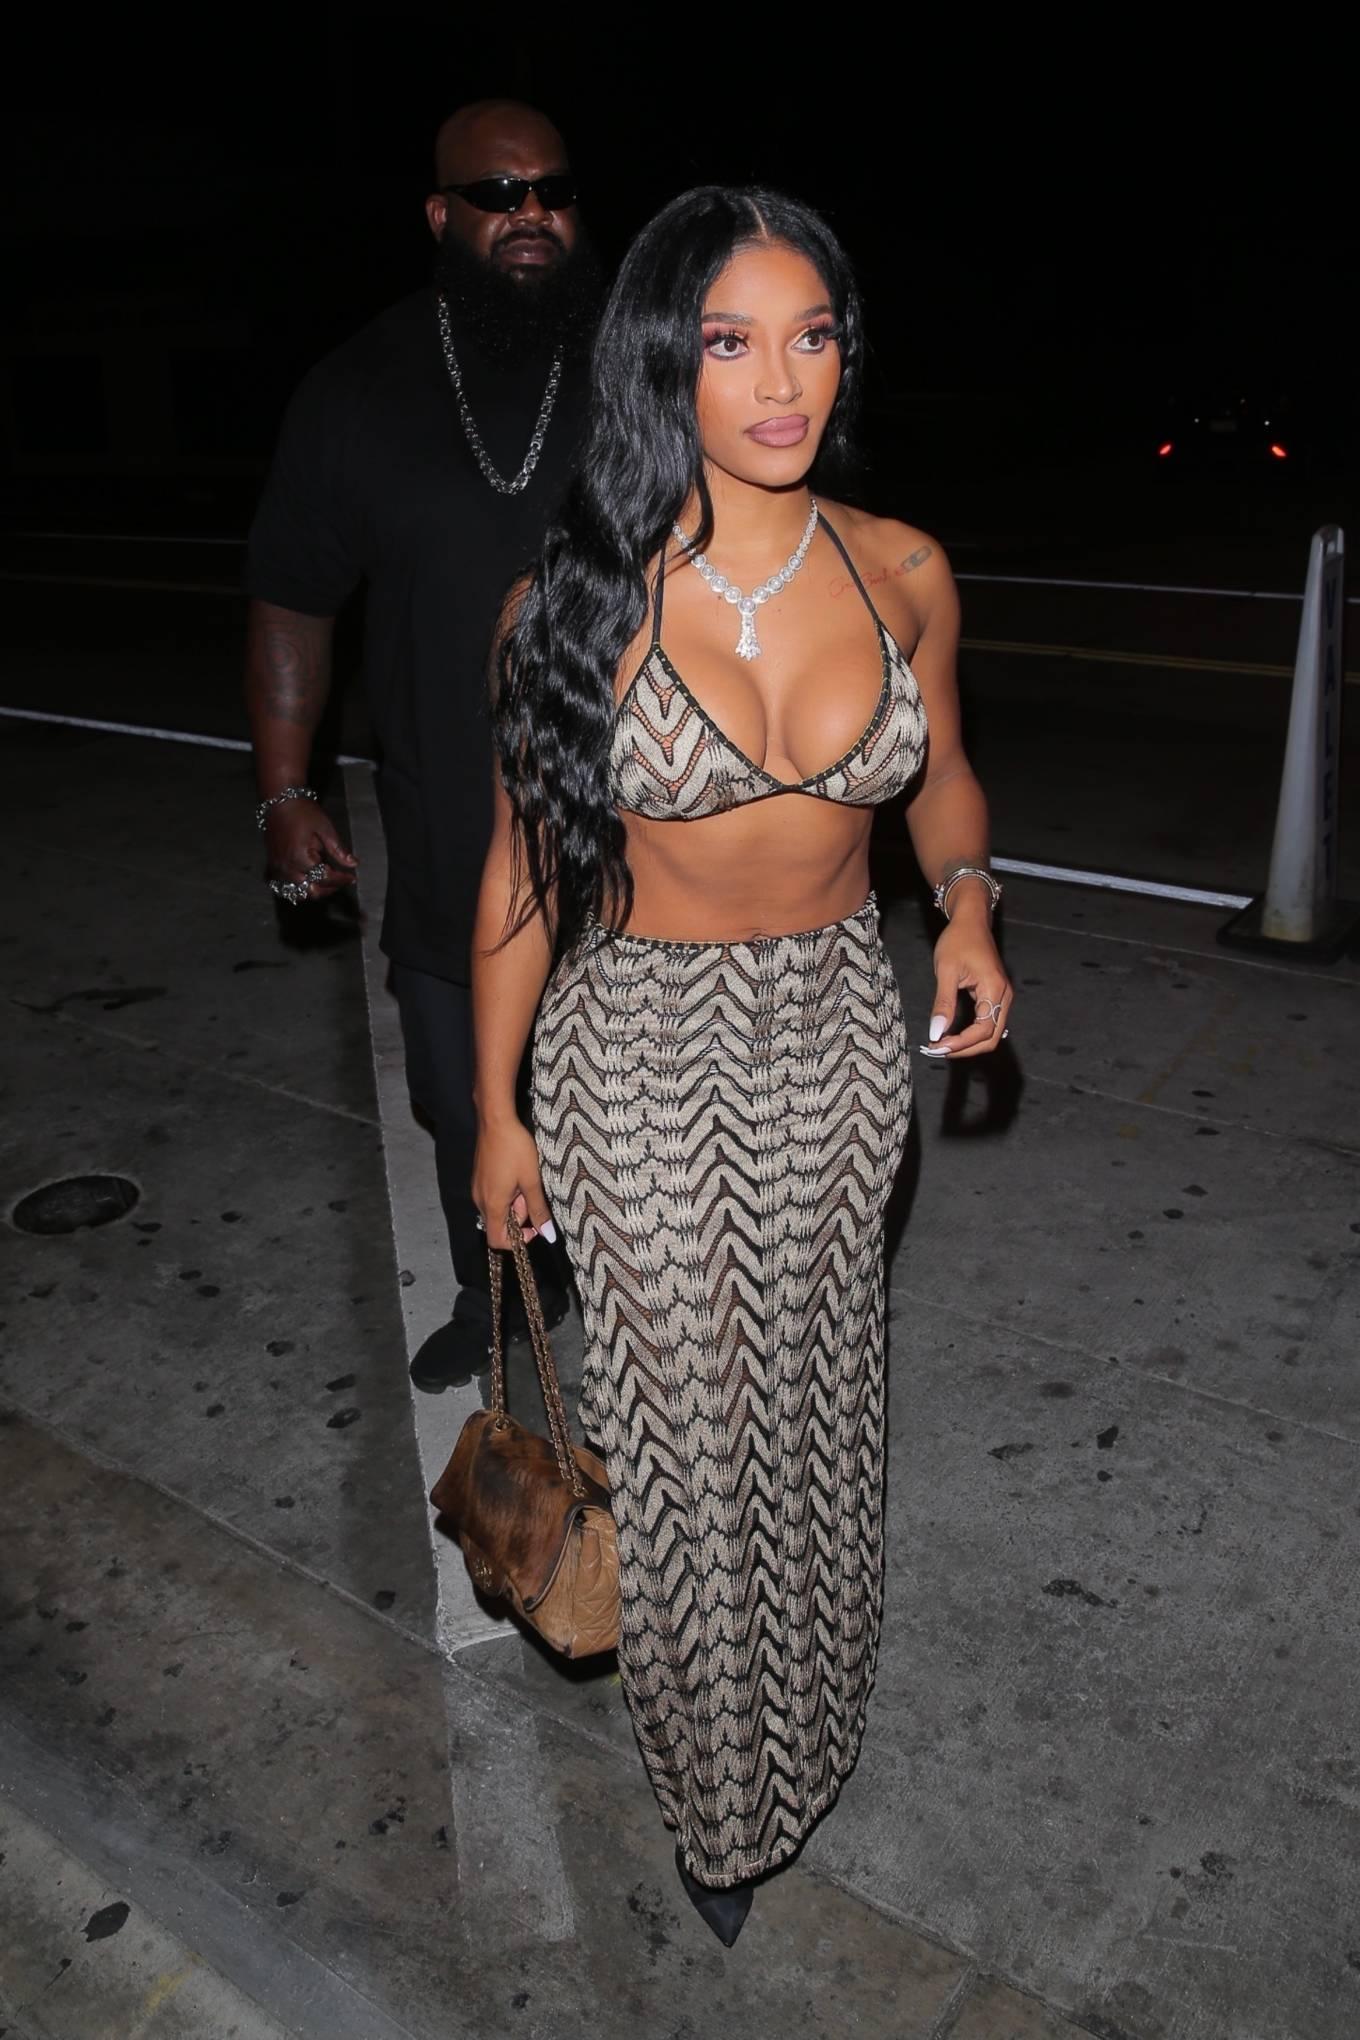 Joseline Hernandez 2021 : Joseline Hernandez – Seen at dinner with husband DJ Ballistic at Catch LA in West Hollywood-37